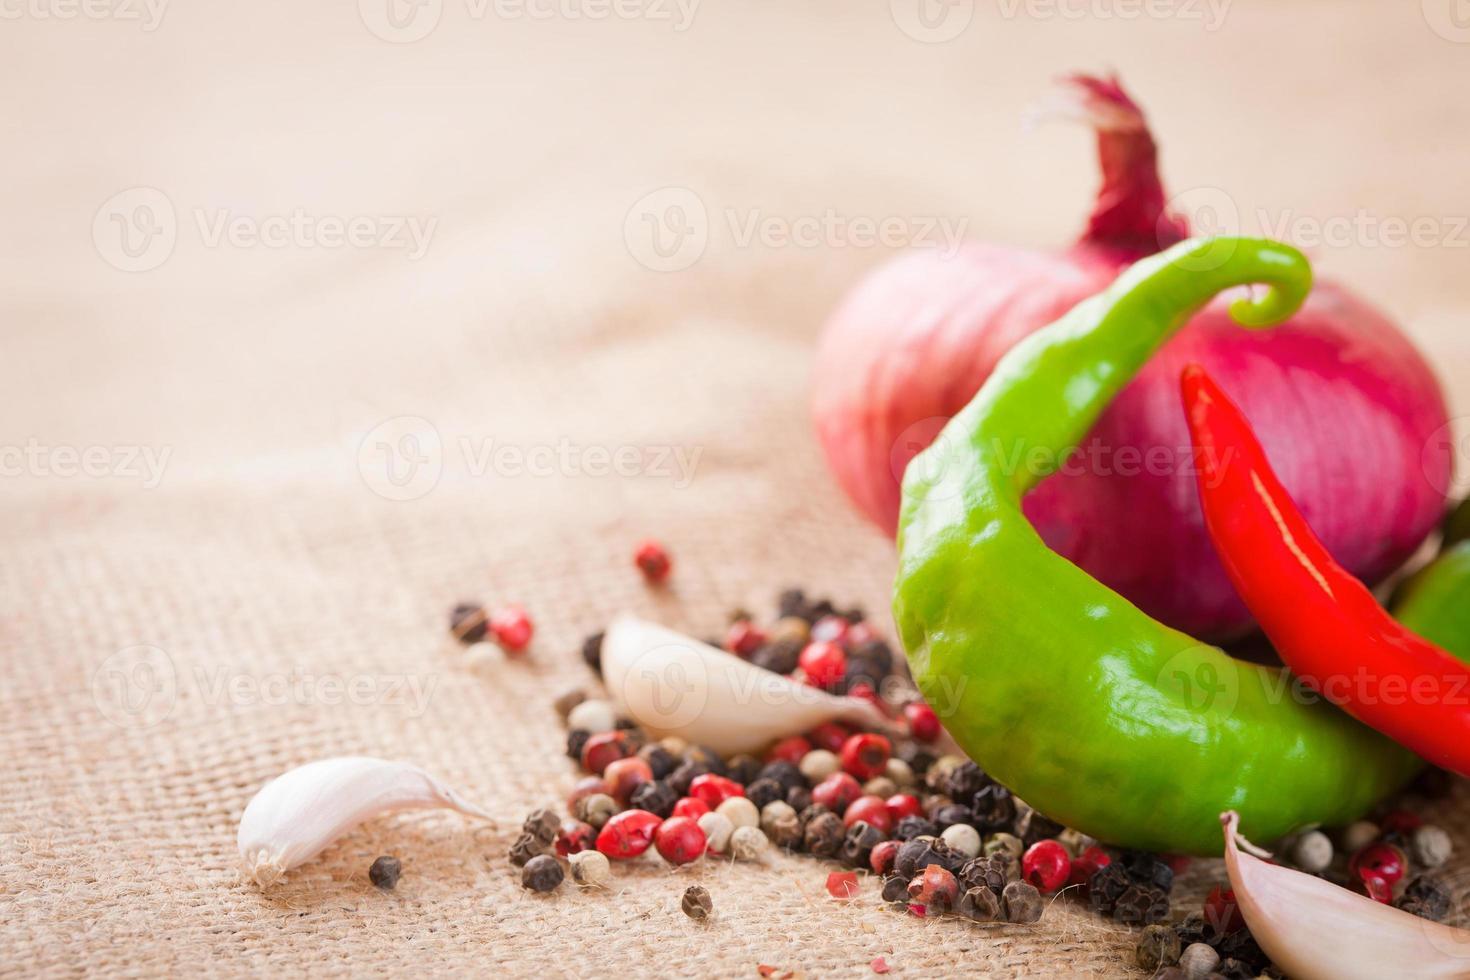 uien, knoflook, chilipeper en kruiden op tafel foto